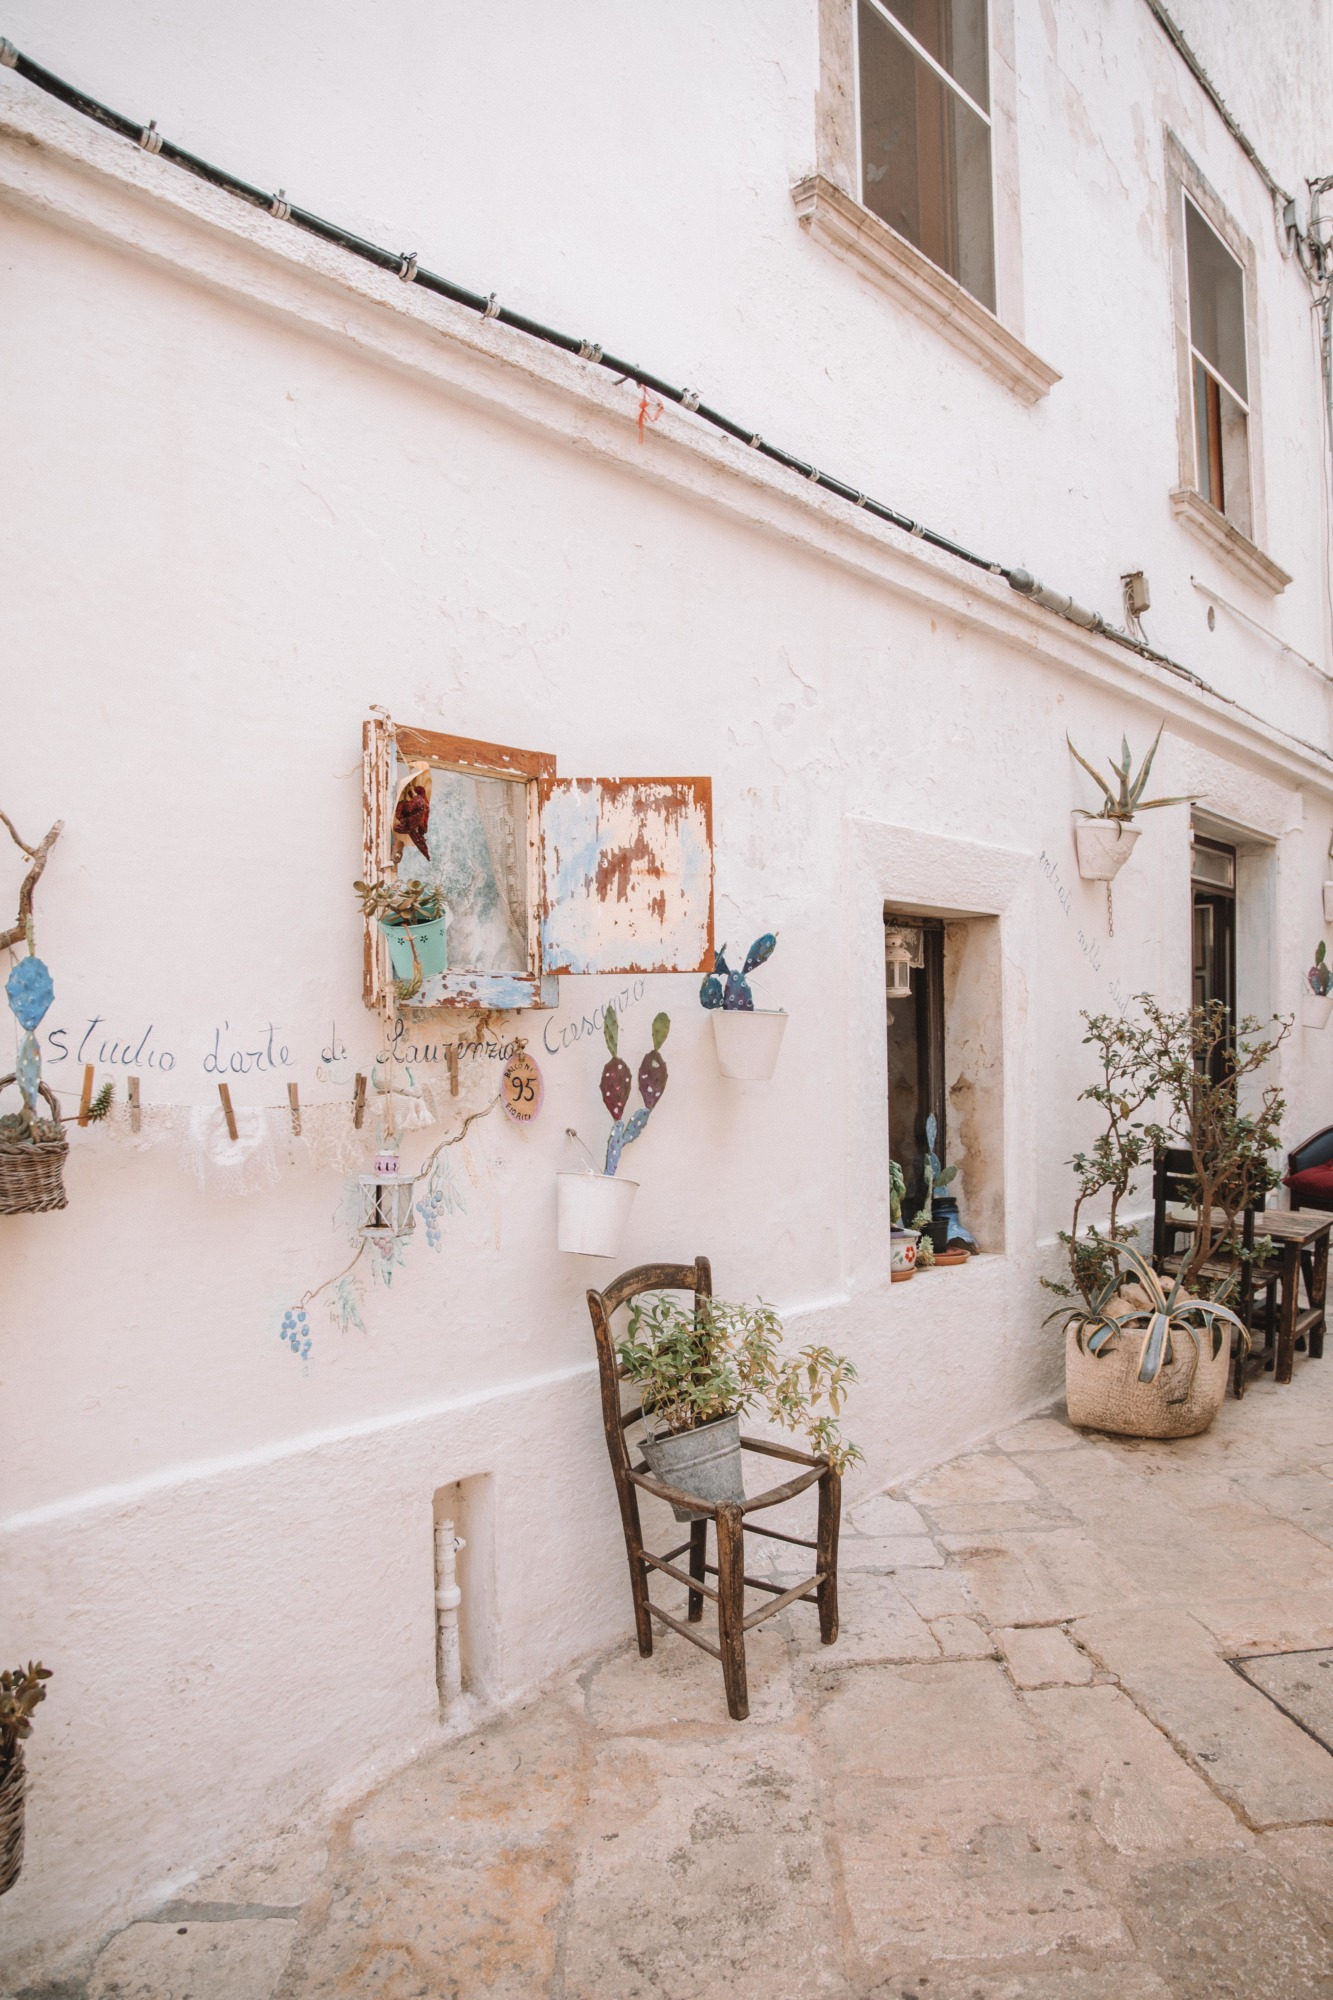 Visiter Locorotondo les Pouilles - Blondie Baby blog voyages